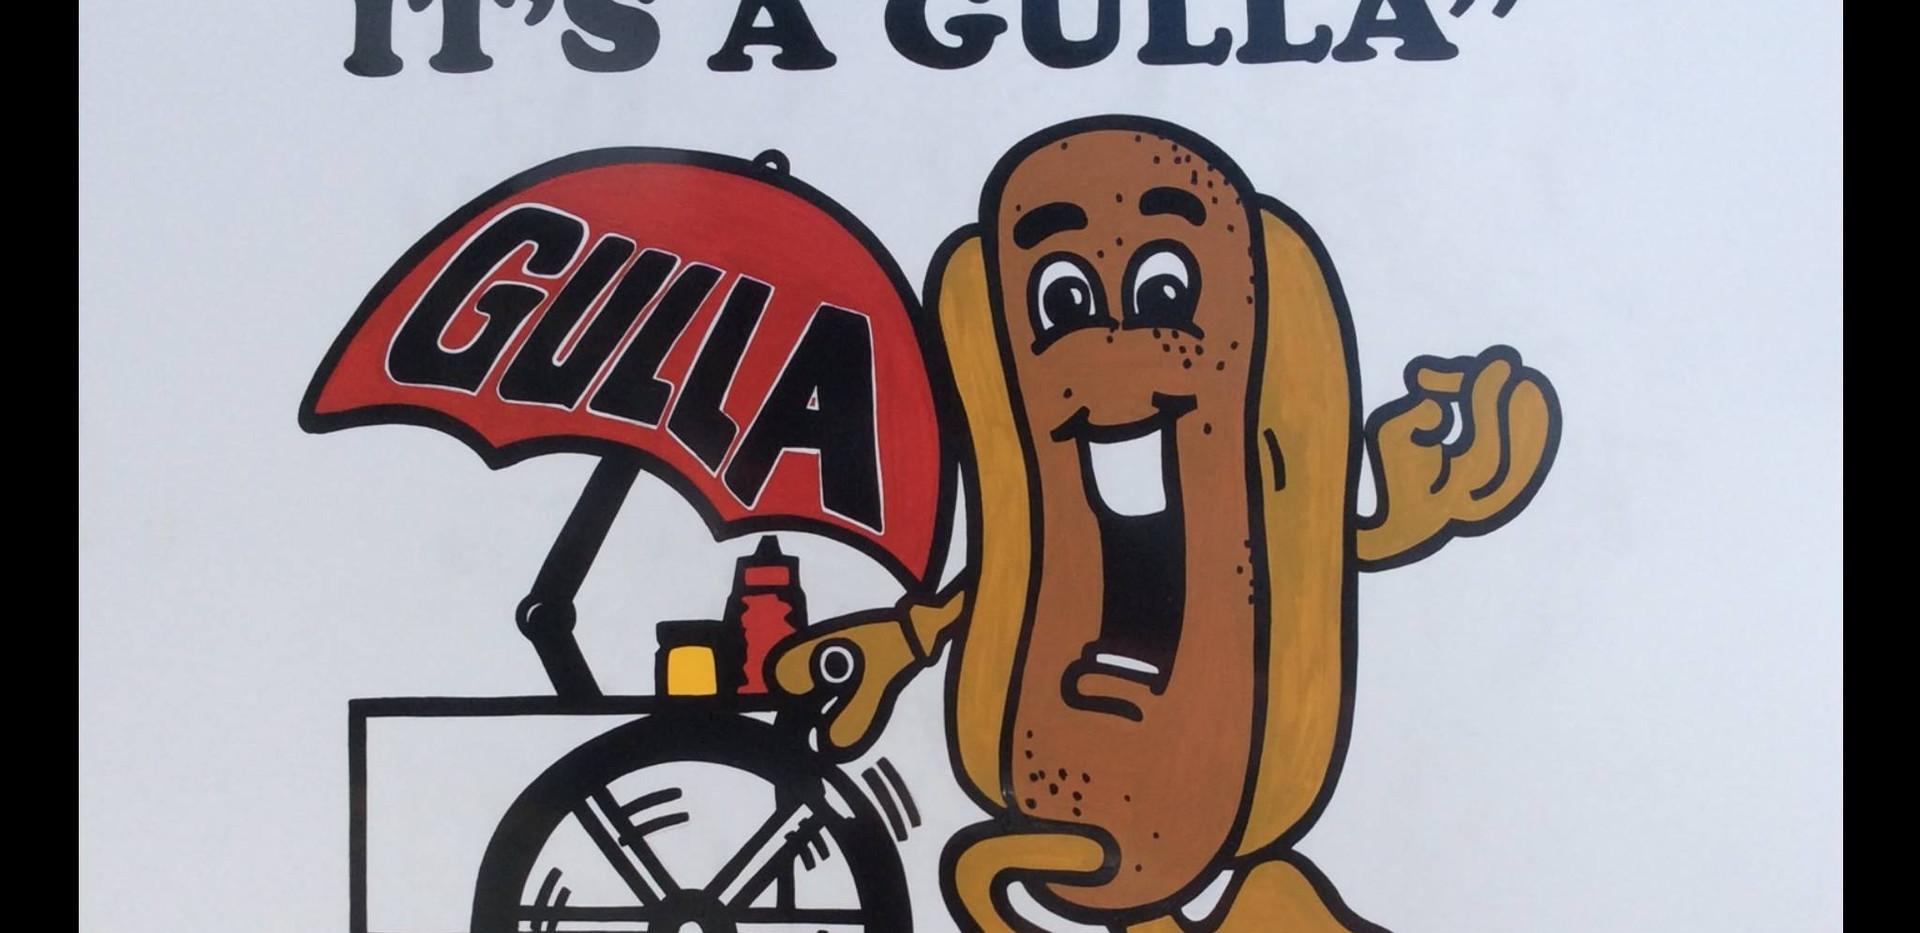 Gulla's Lunch